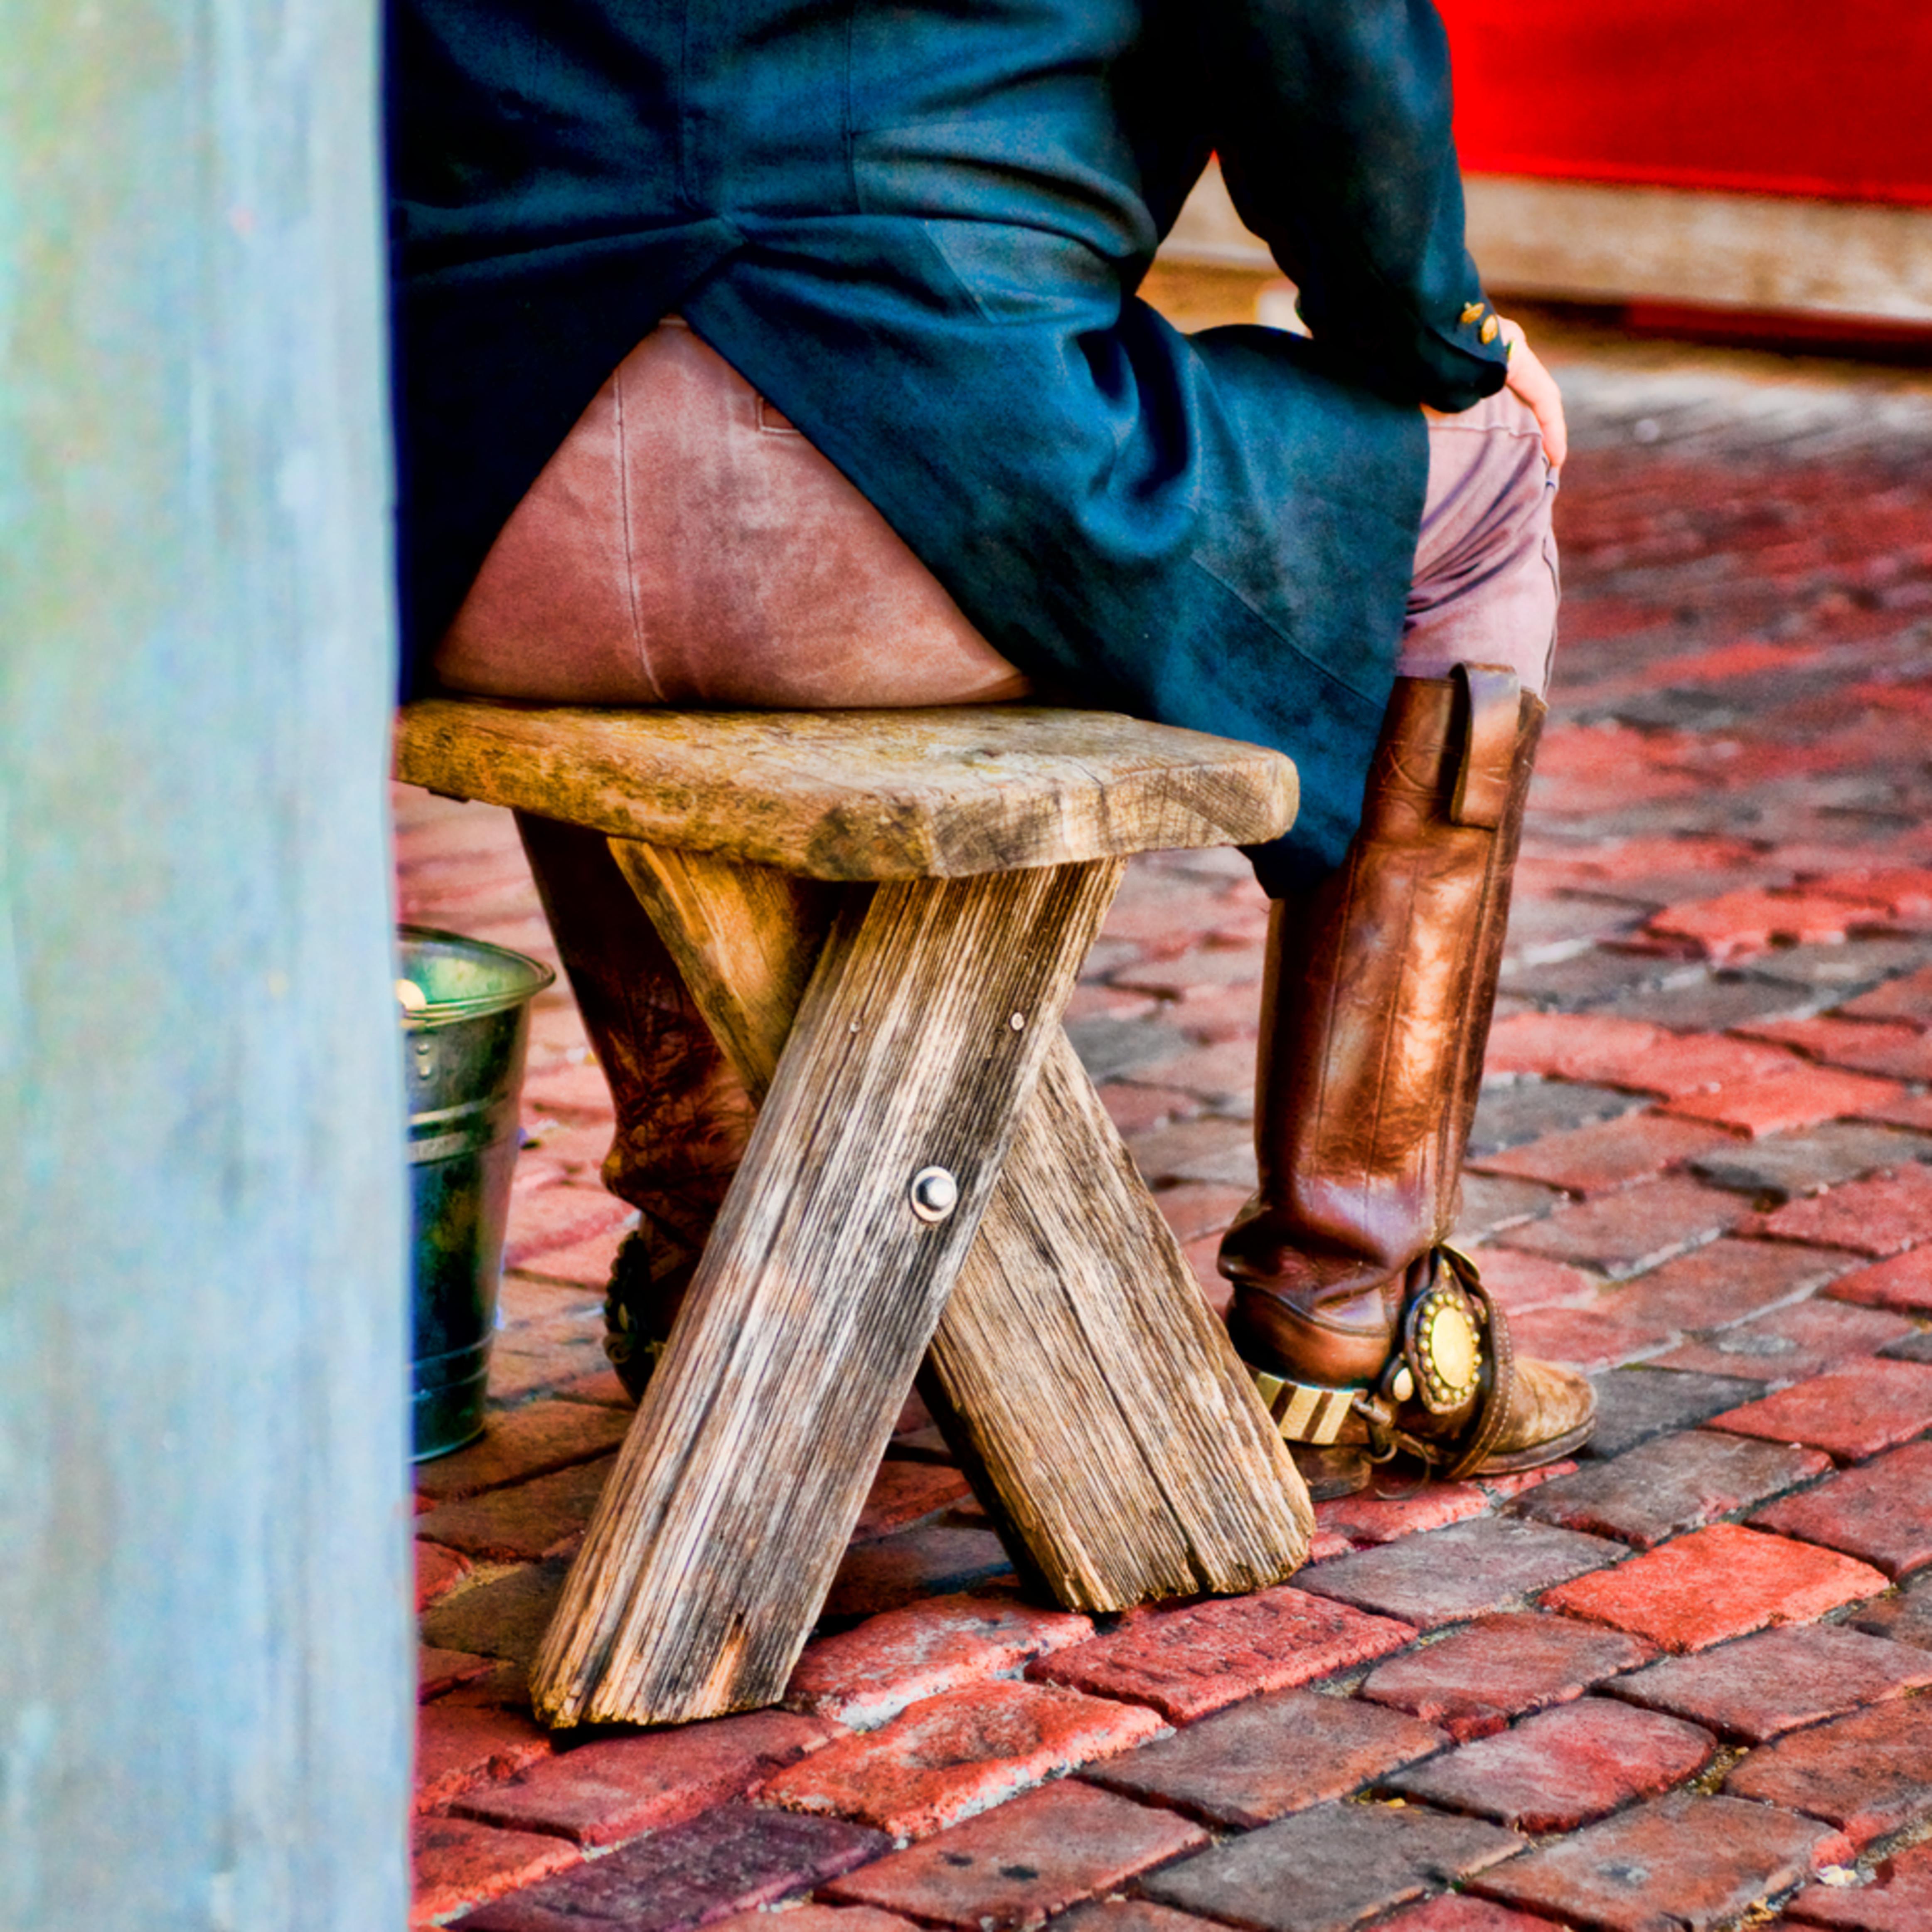 Cowboy sits fw stockyards dsc 0137 opscoq